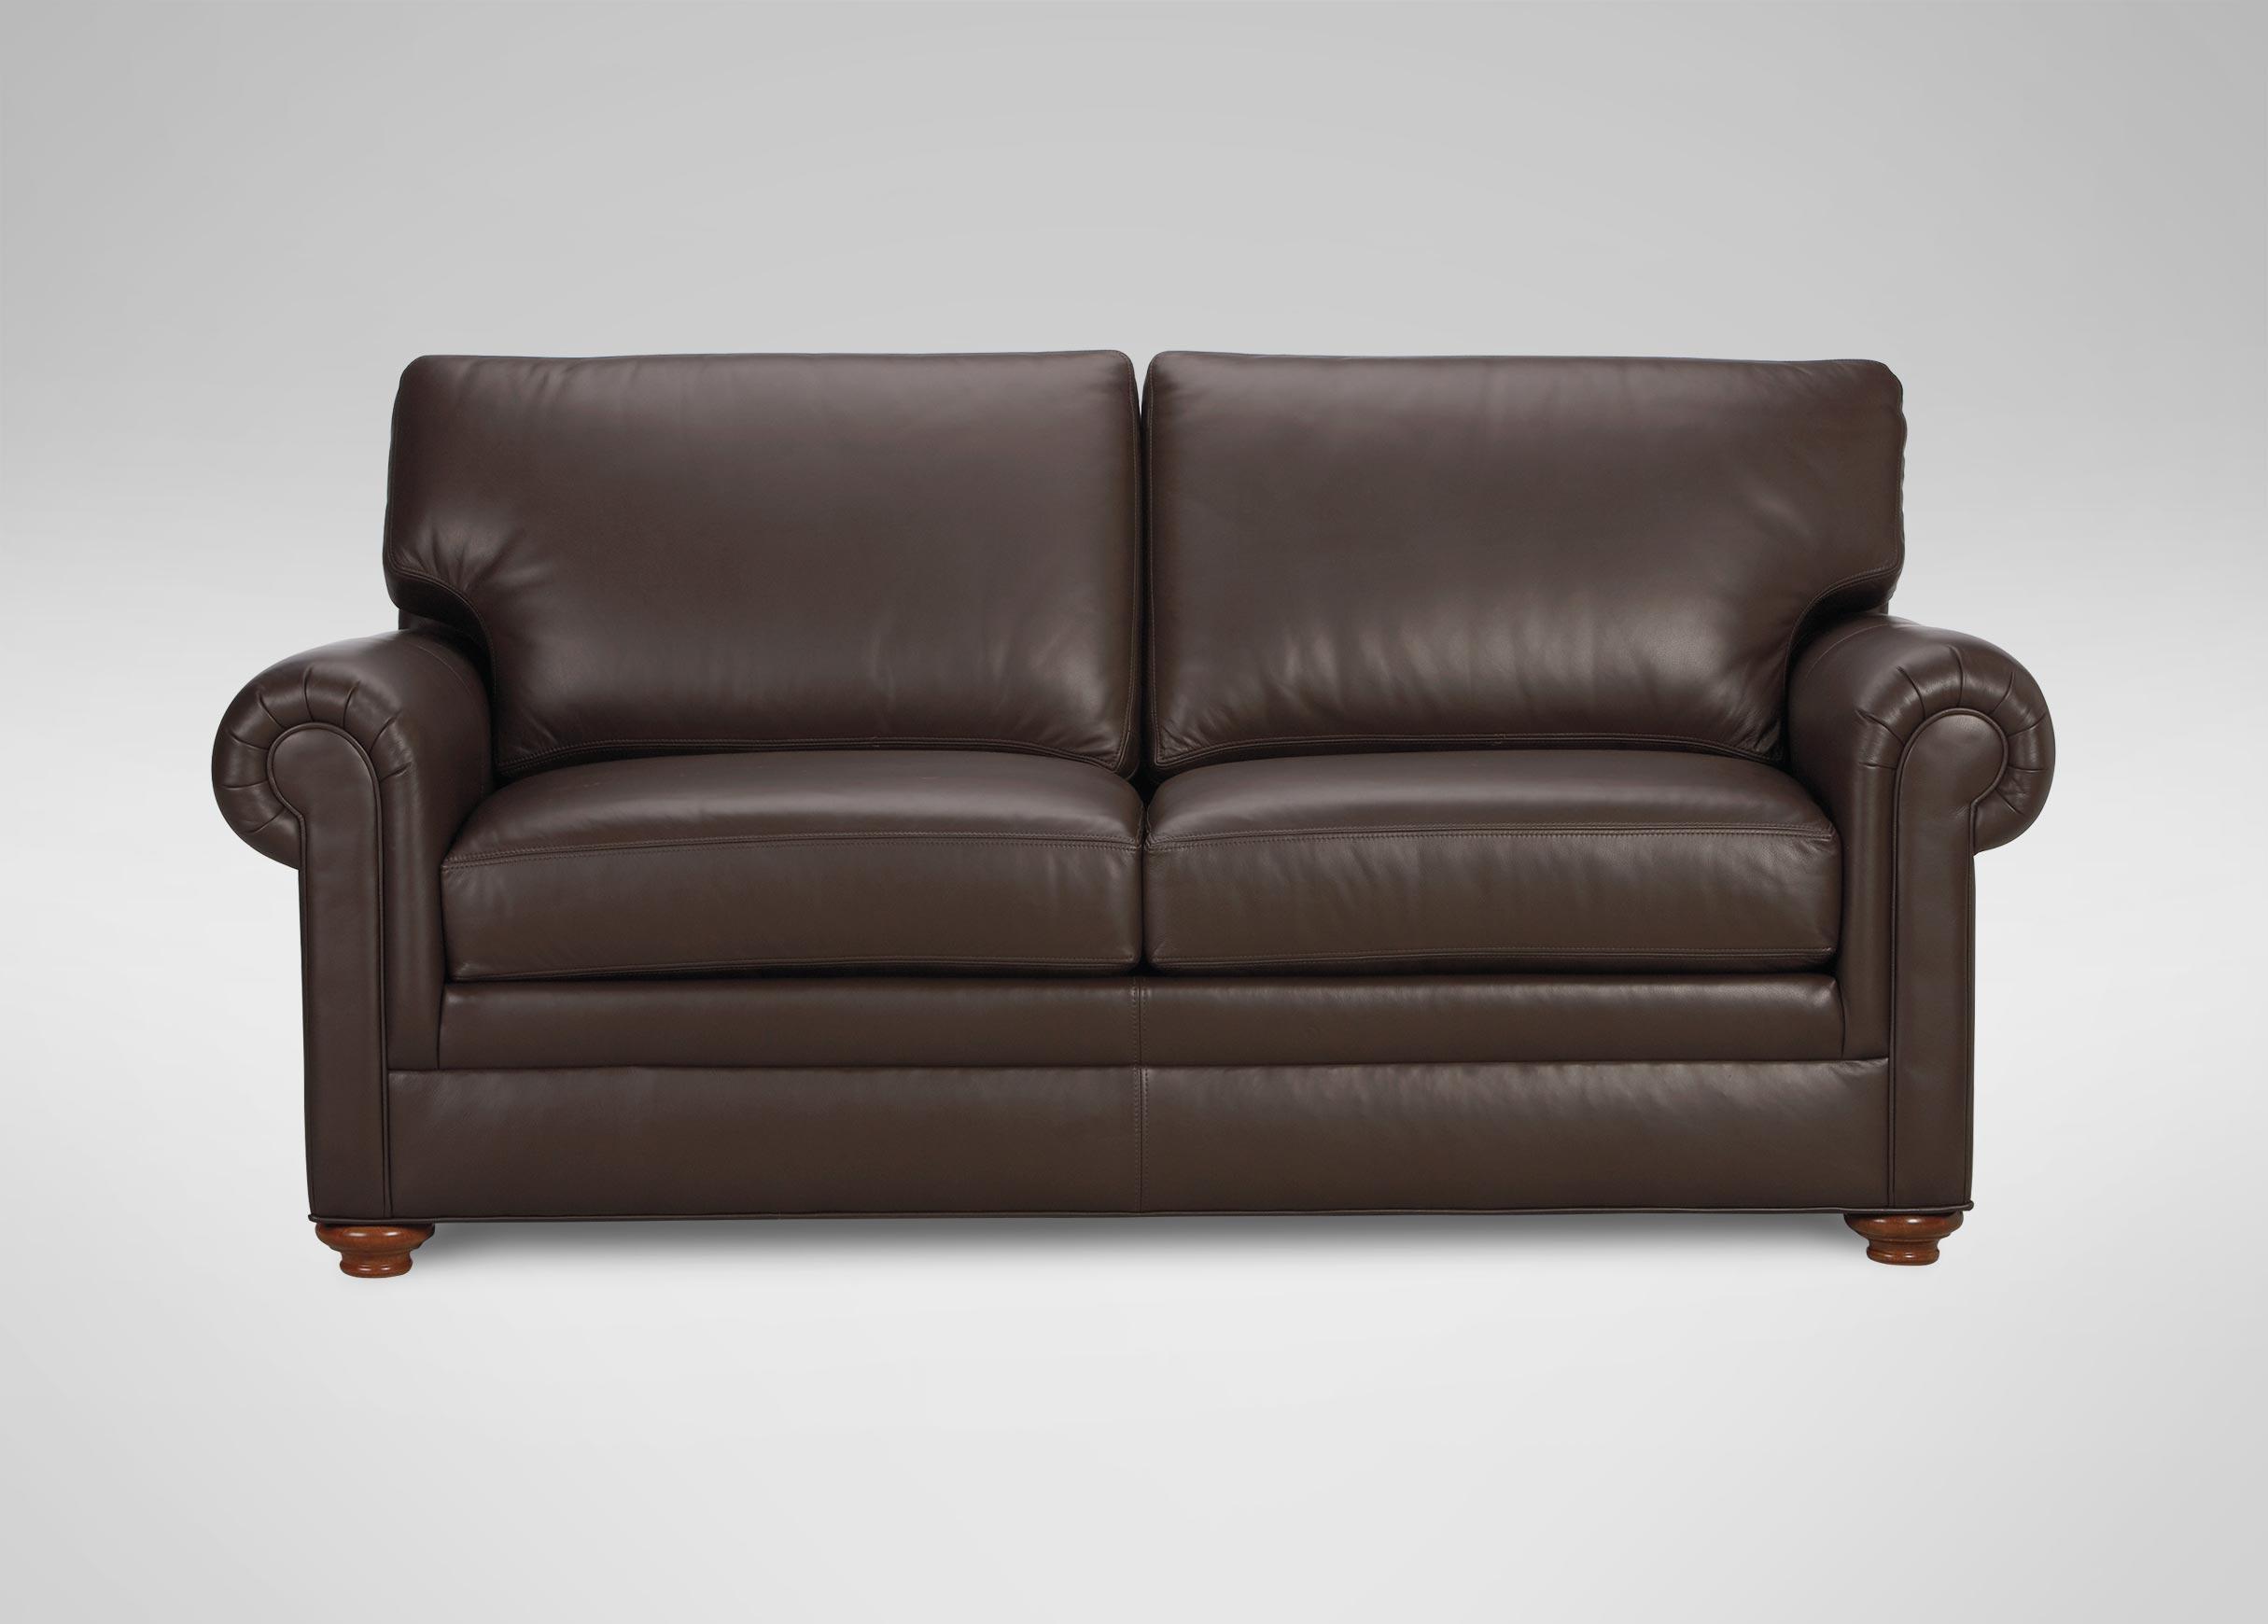 Conor Leather Sofa